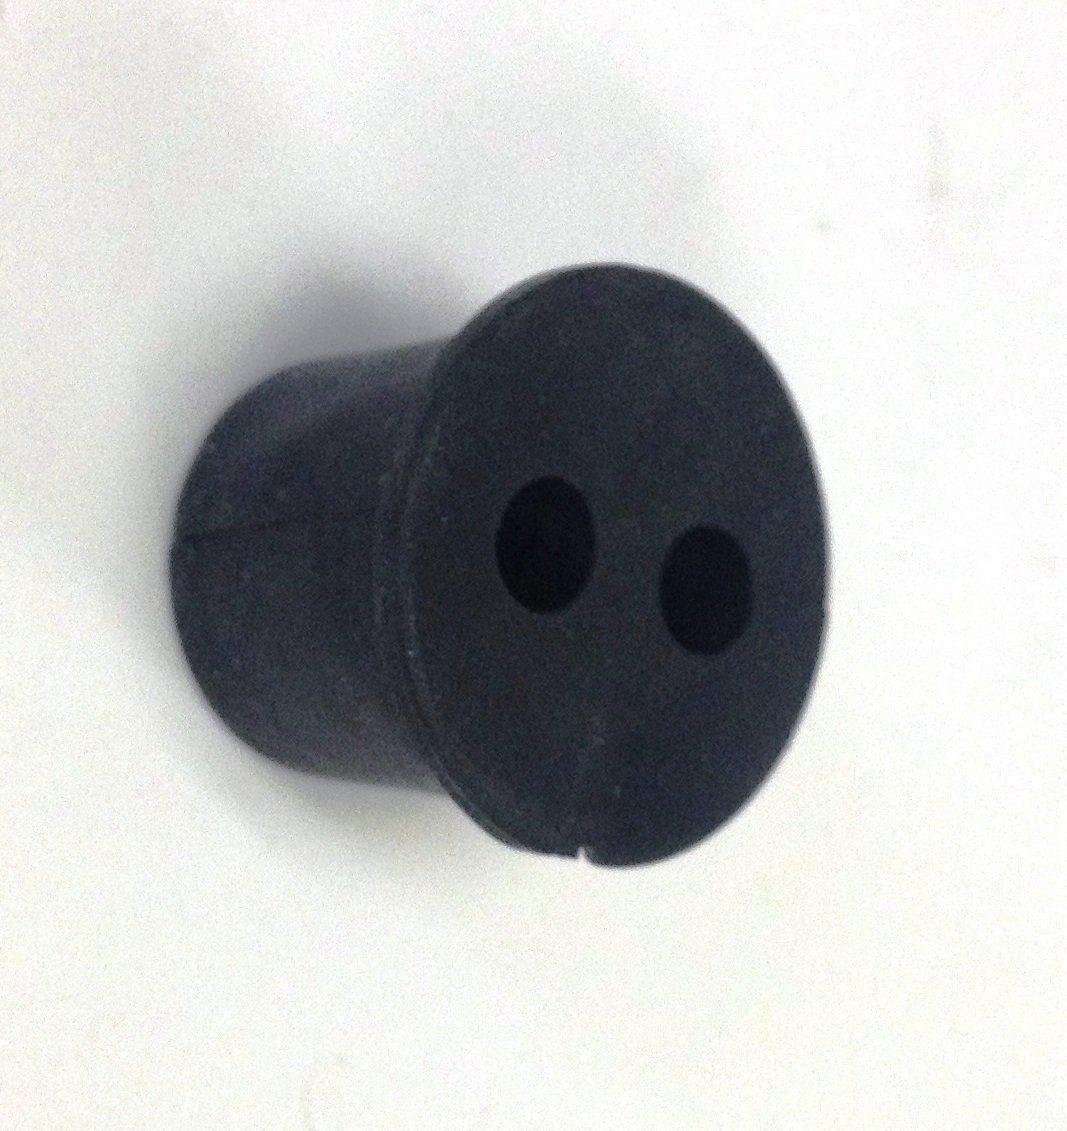 Wiring Plug-2 Hole